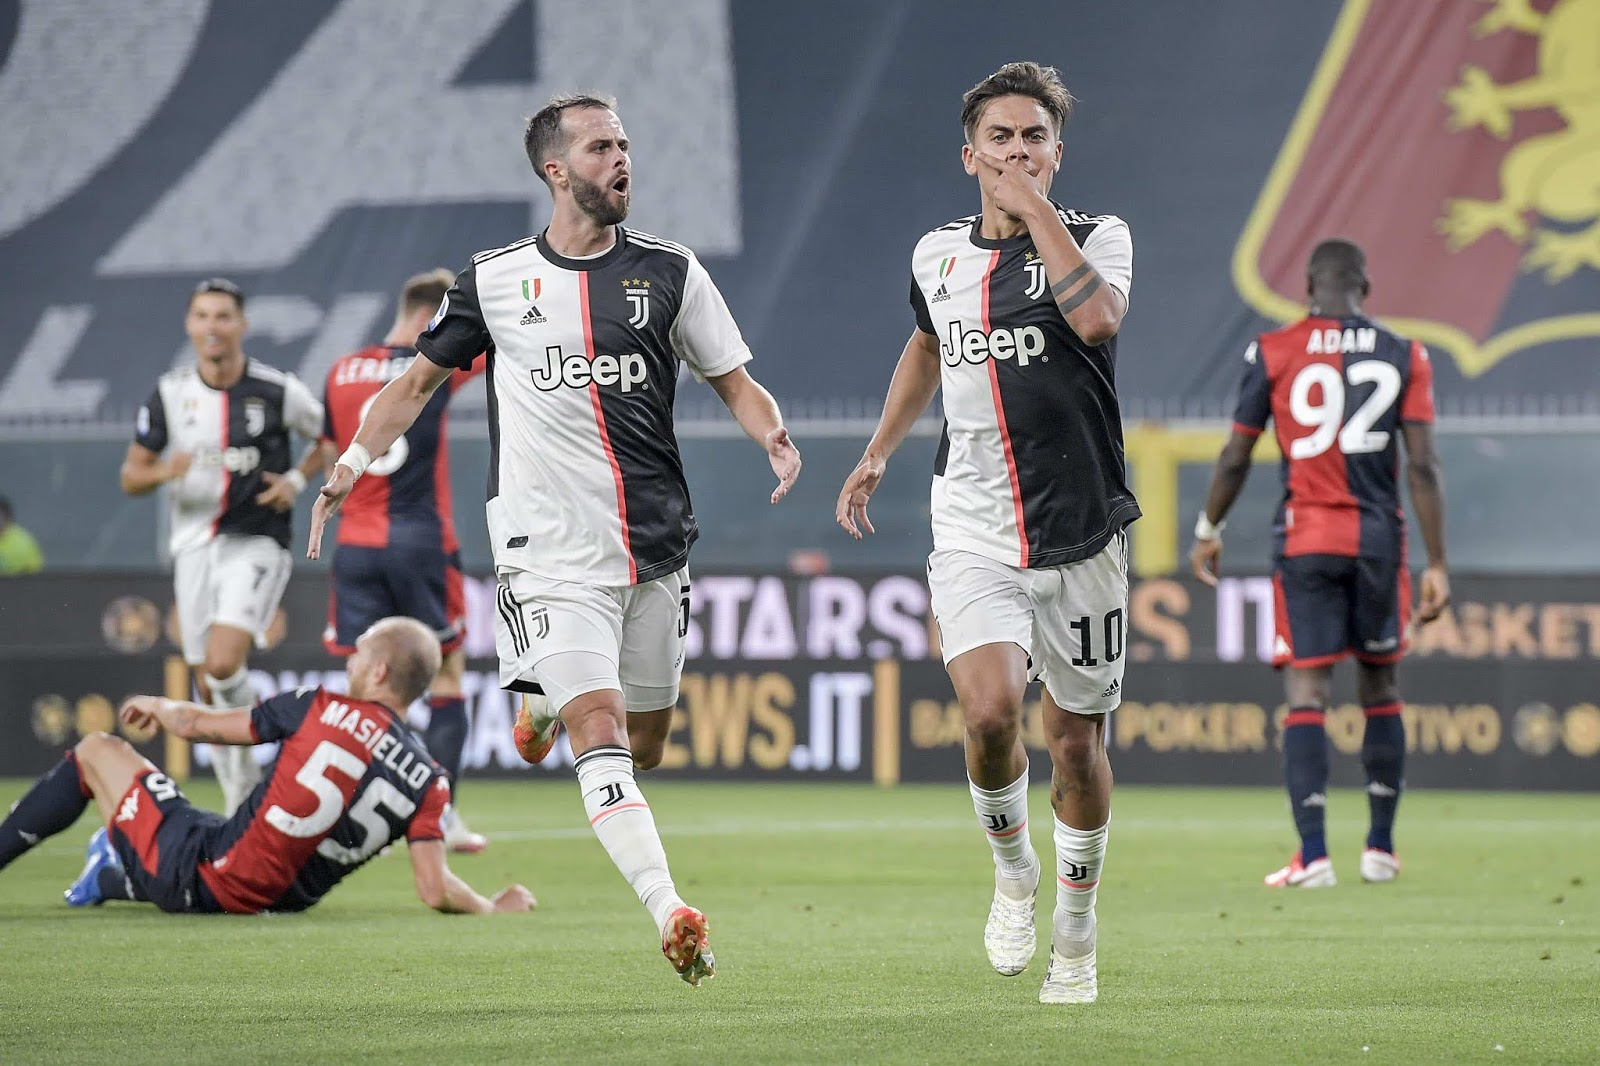 Dybala encaminó a Juventus a la sexta victoria consecutiva en la Serie A